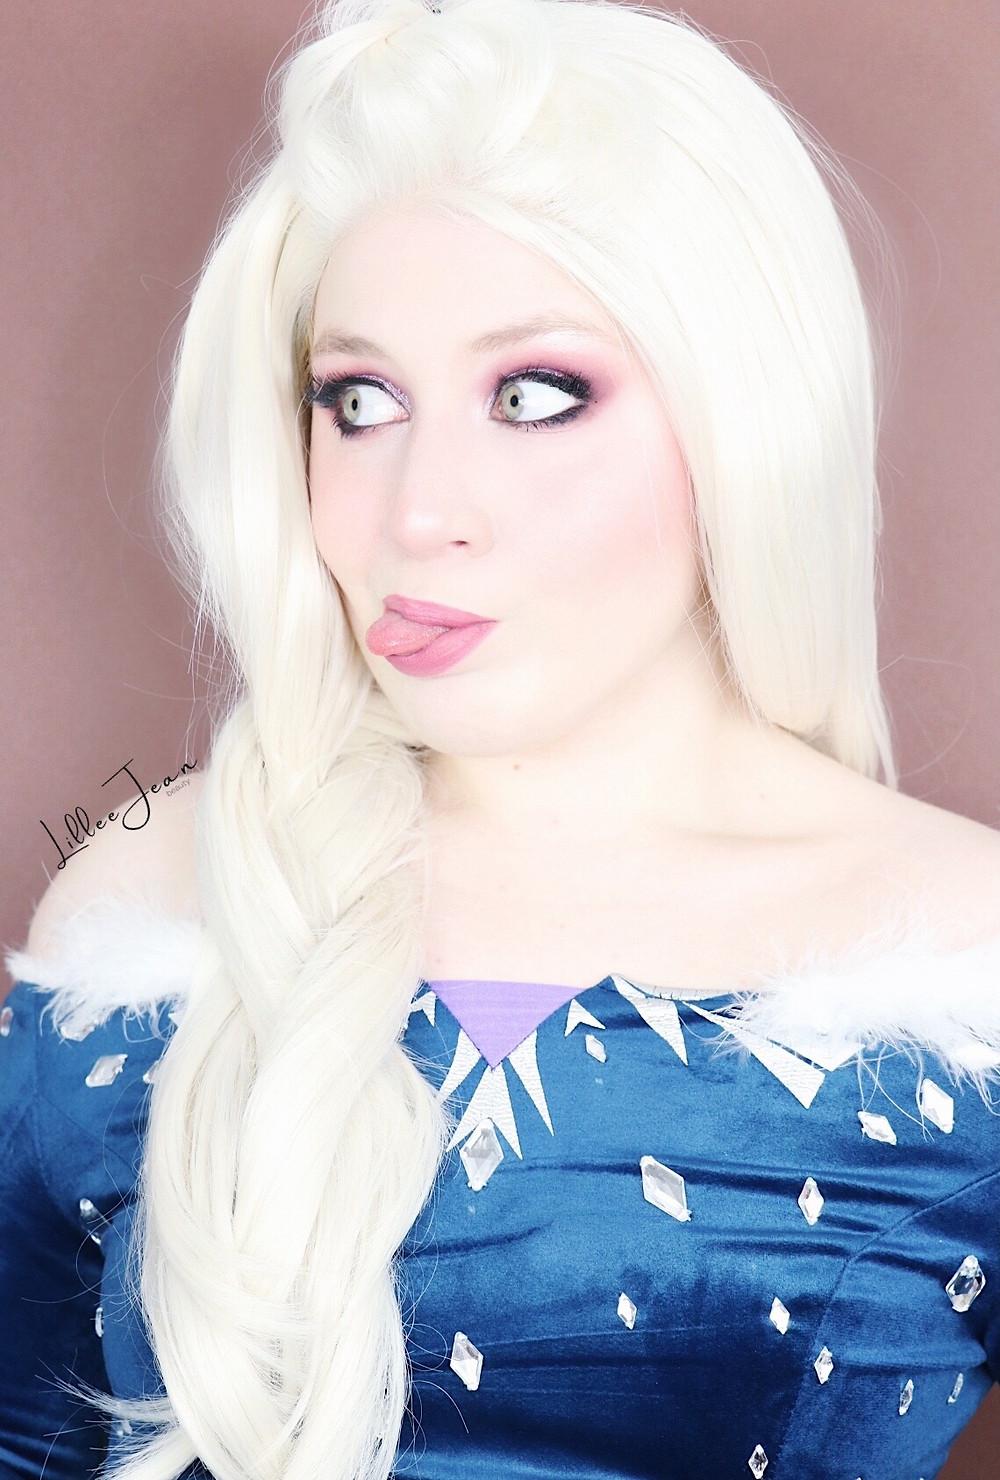 Elsa Olaf's Frozen Adventure Disney Princess HOLIDAY Makeup Tutorial 2020 | Lillee Jean